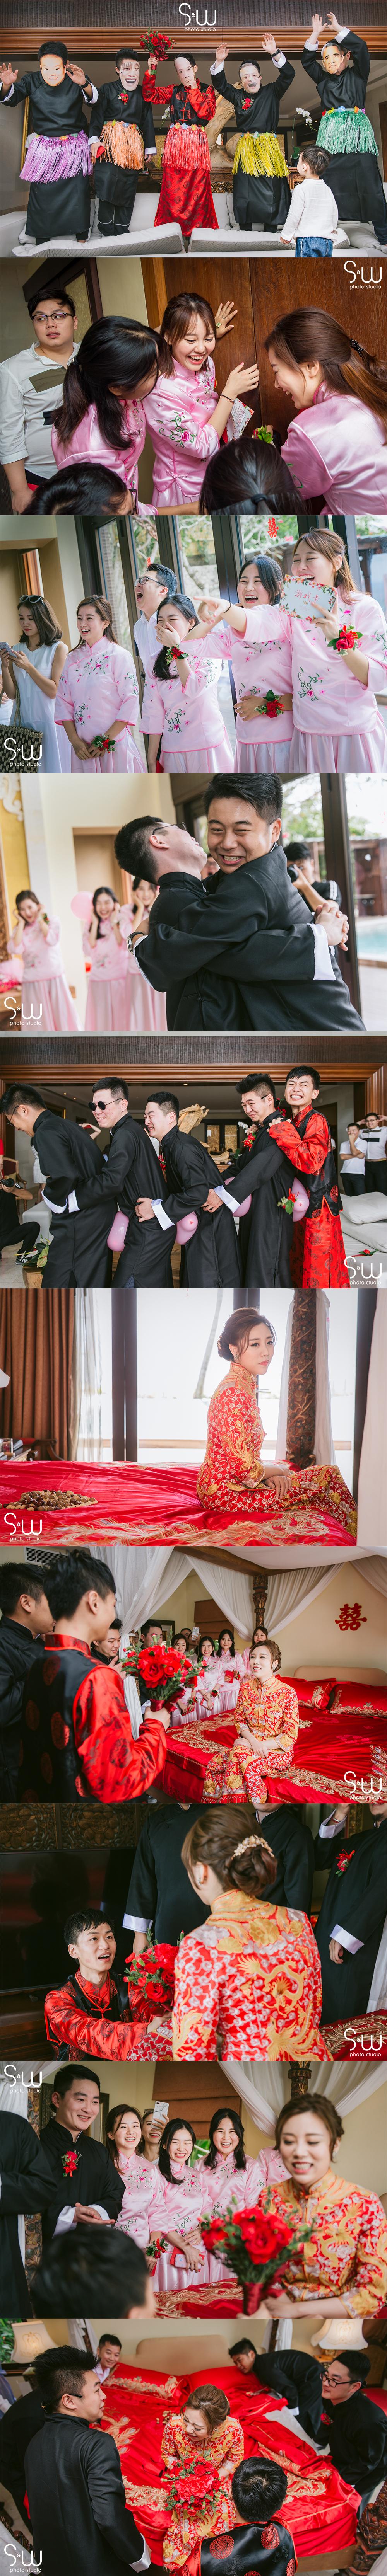 WEDDING | Ayana Wedding Villa,Bali (峇里島婚禮) | sw photo studio 婚禮, 婚攝, 婚紗, 海外婚禮, 海外婚紗, 海島婚禮,峇里島婚禮, 峇里島婚紗, 台灣婚禮, 婚攝推薦